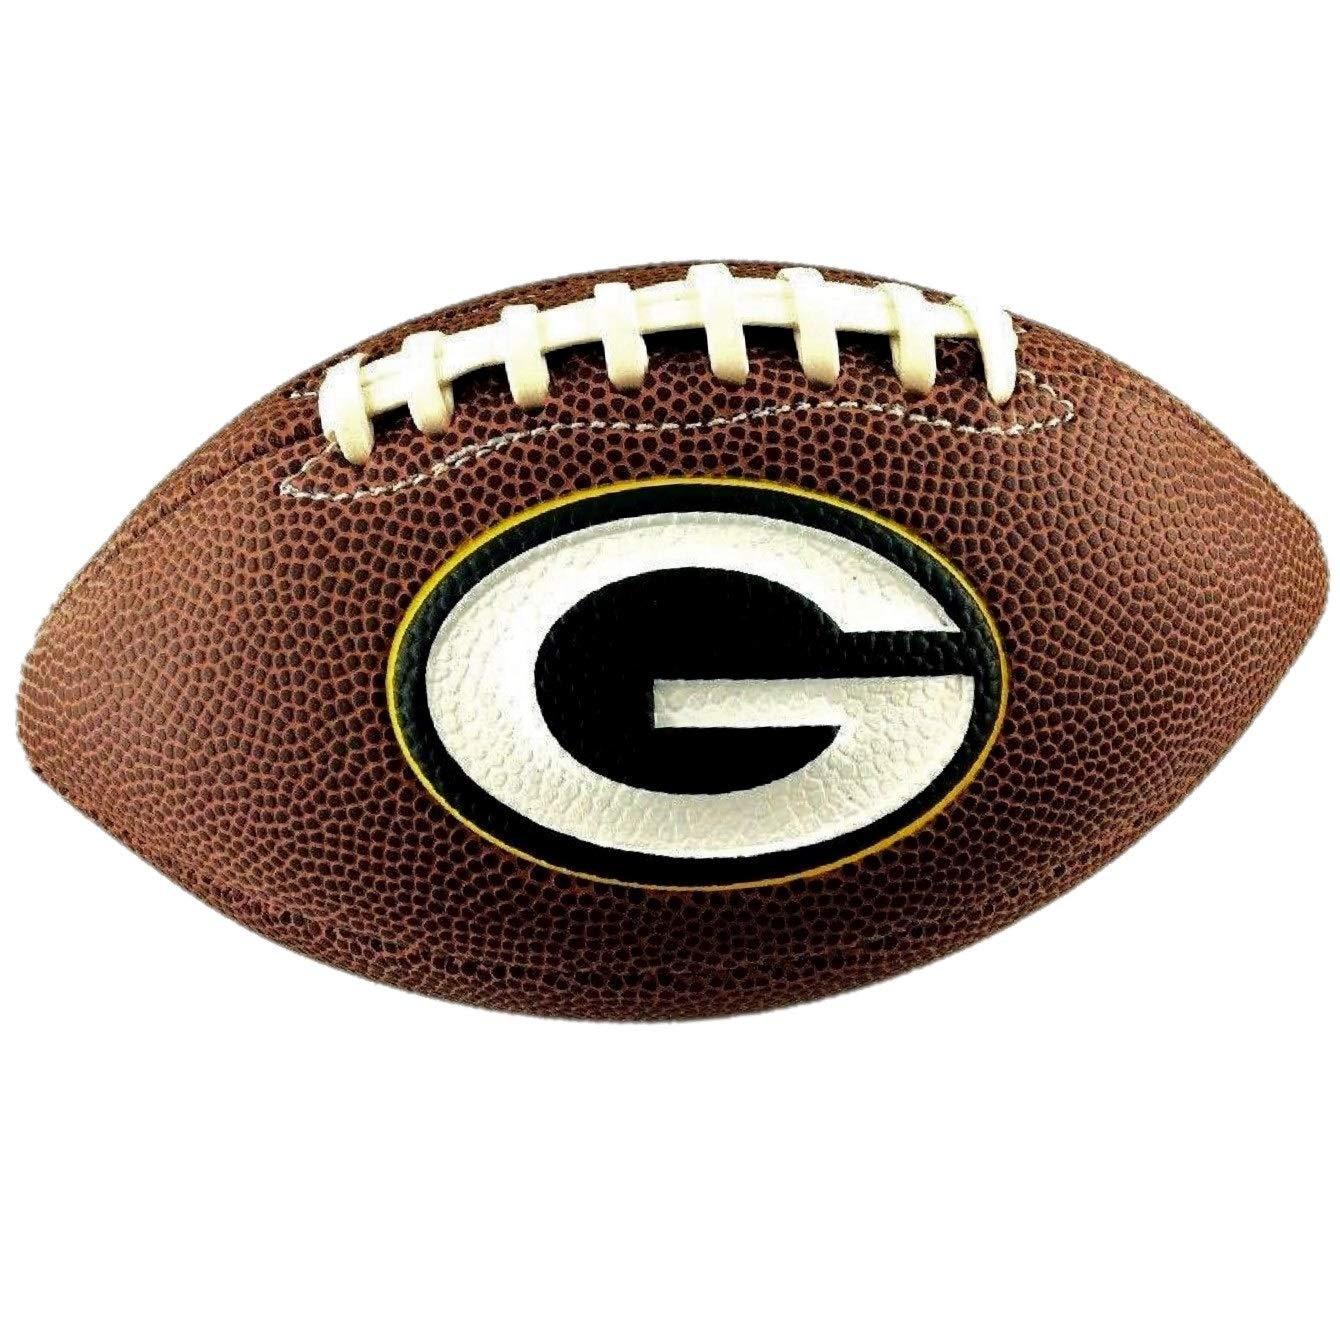 Jarden Sport NFLチームロゴ ミニサイズ フットボール グリーンベイパッカーズ B07HKR2Q6N